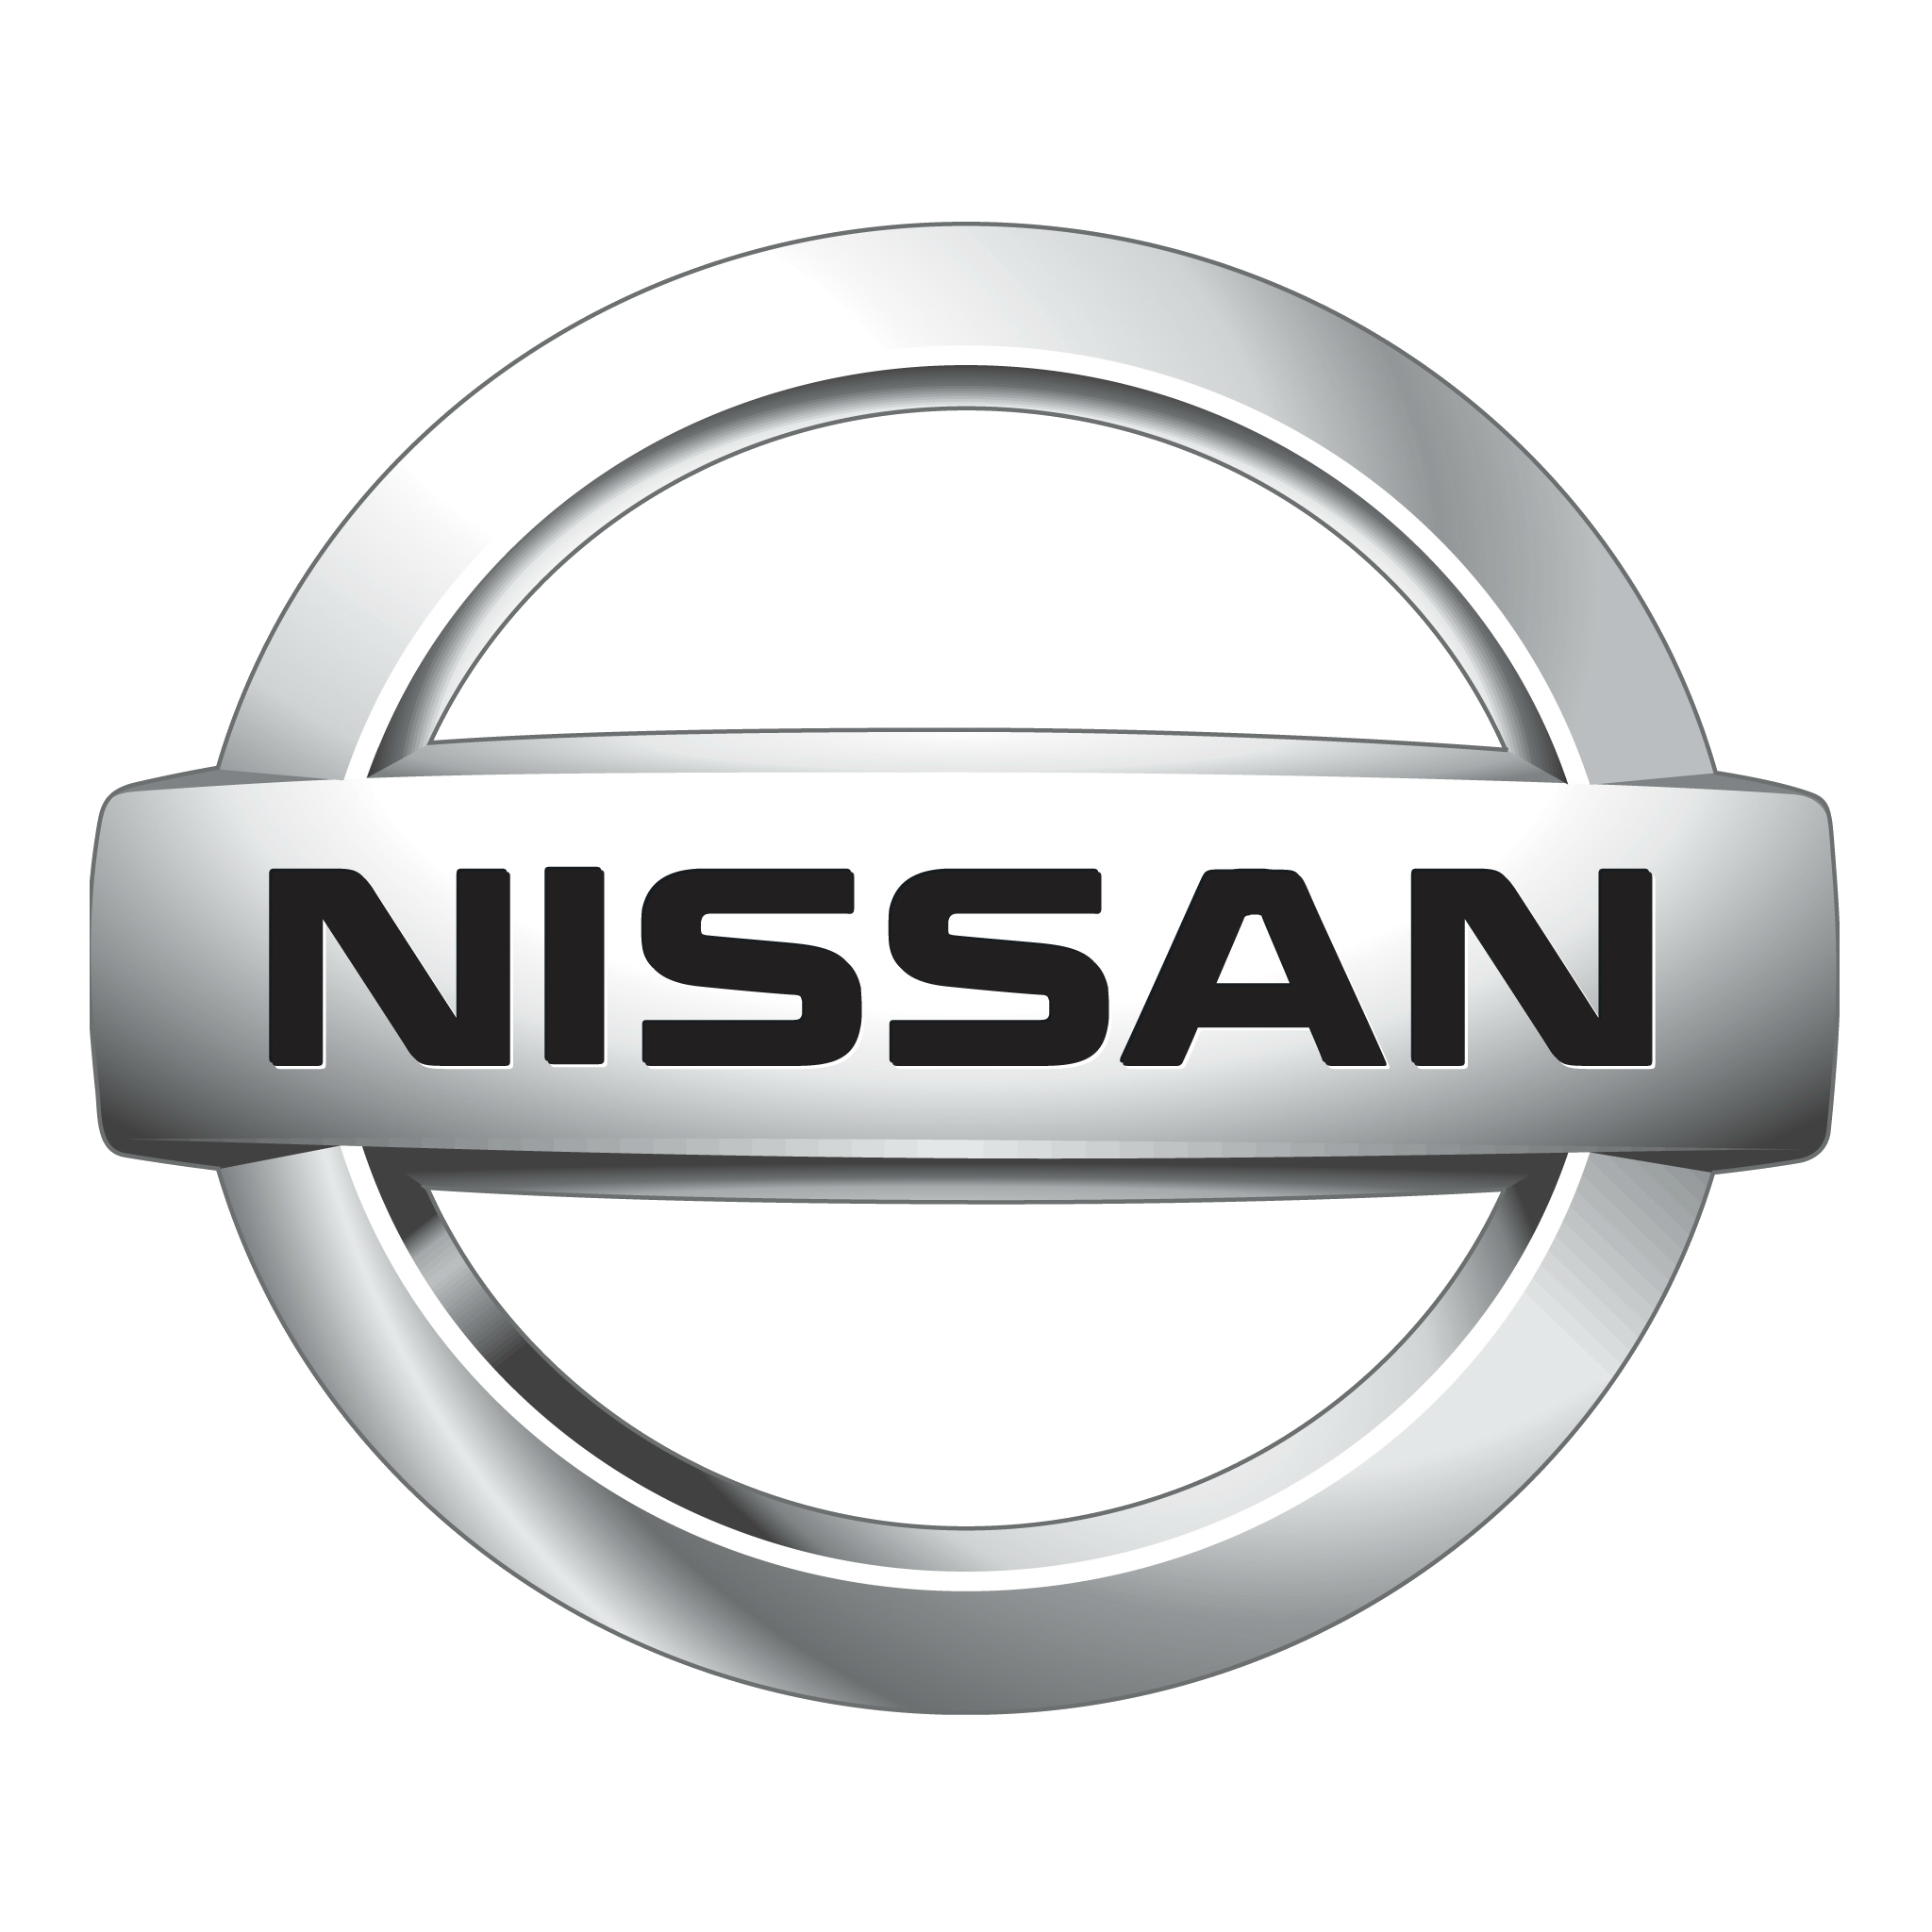 Nissan Logo PNG Image.